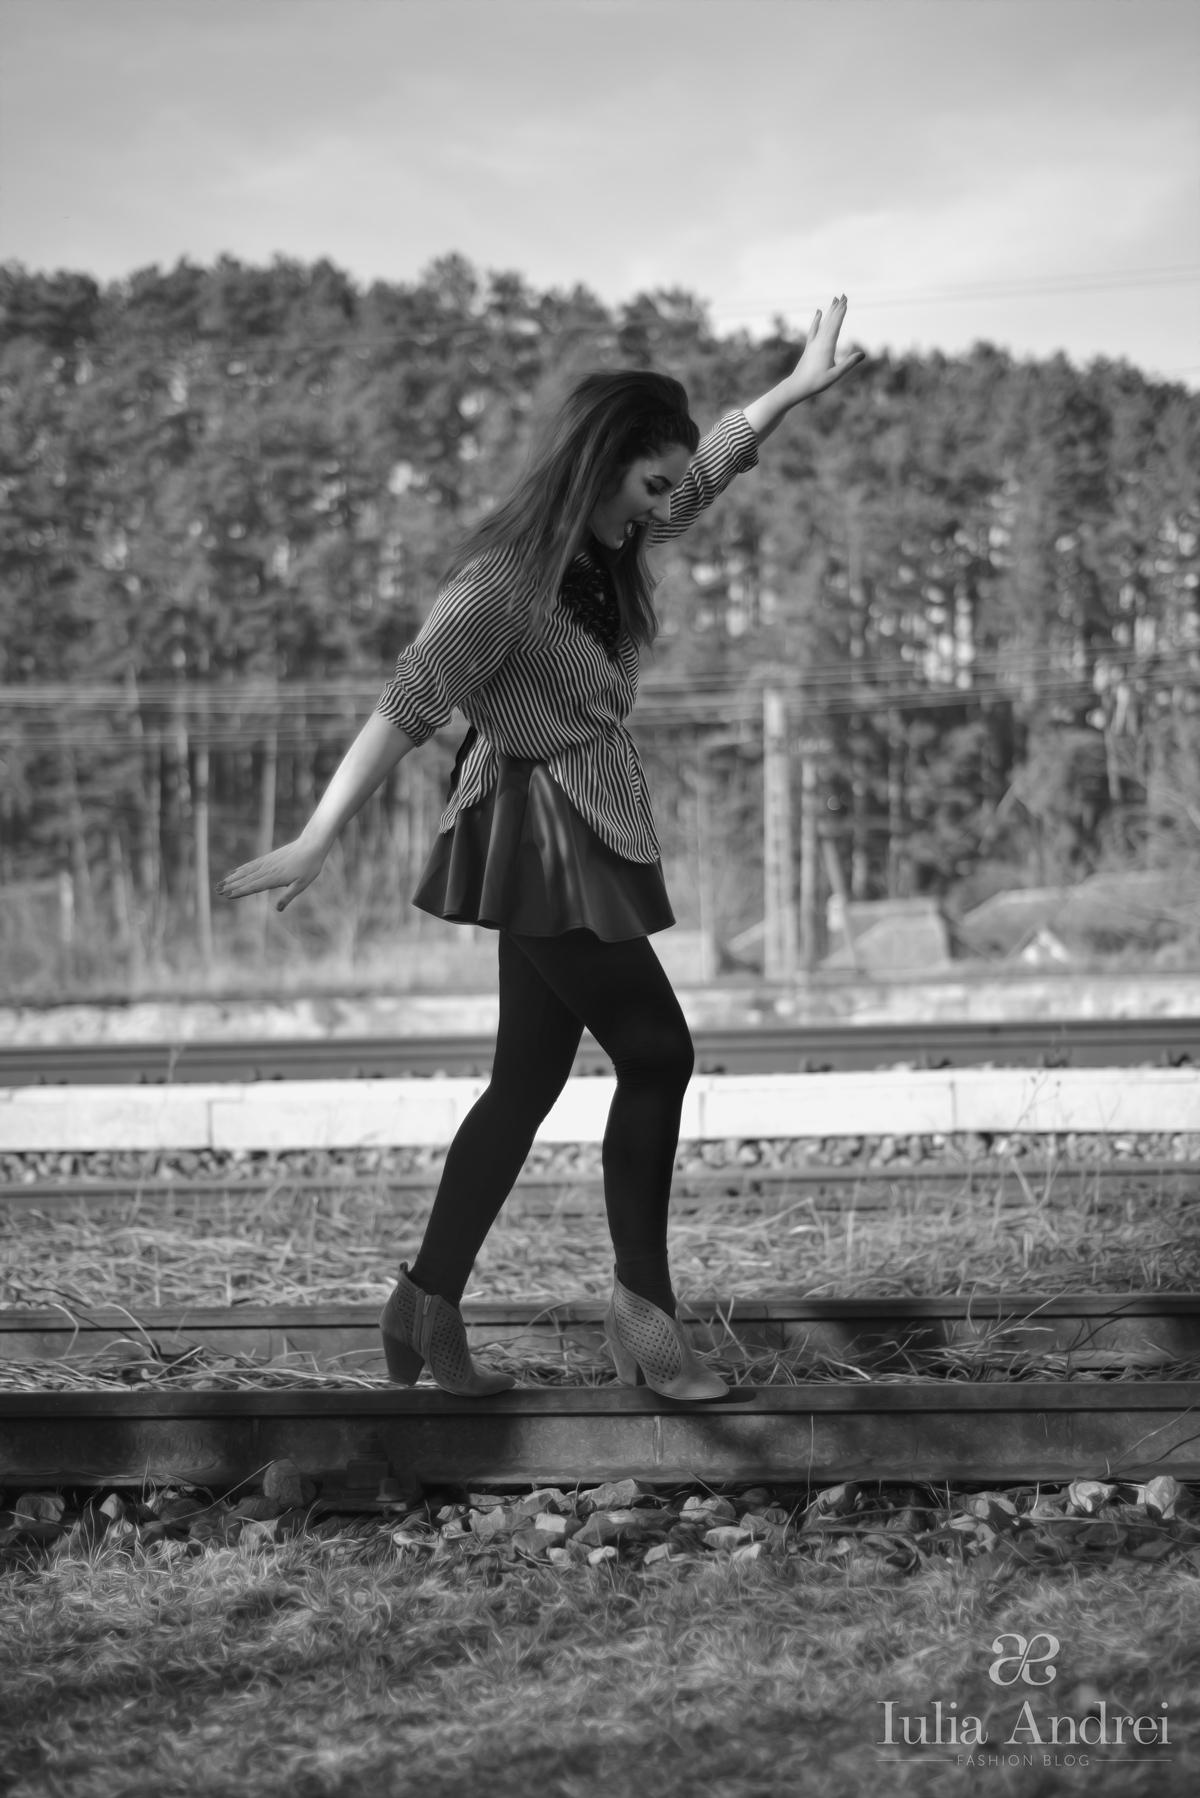 tinuta camasa cu dungi alb negru si fusta din piele pliata iulia andrei fashion blog